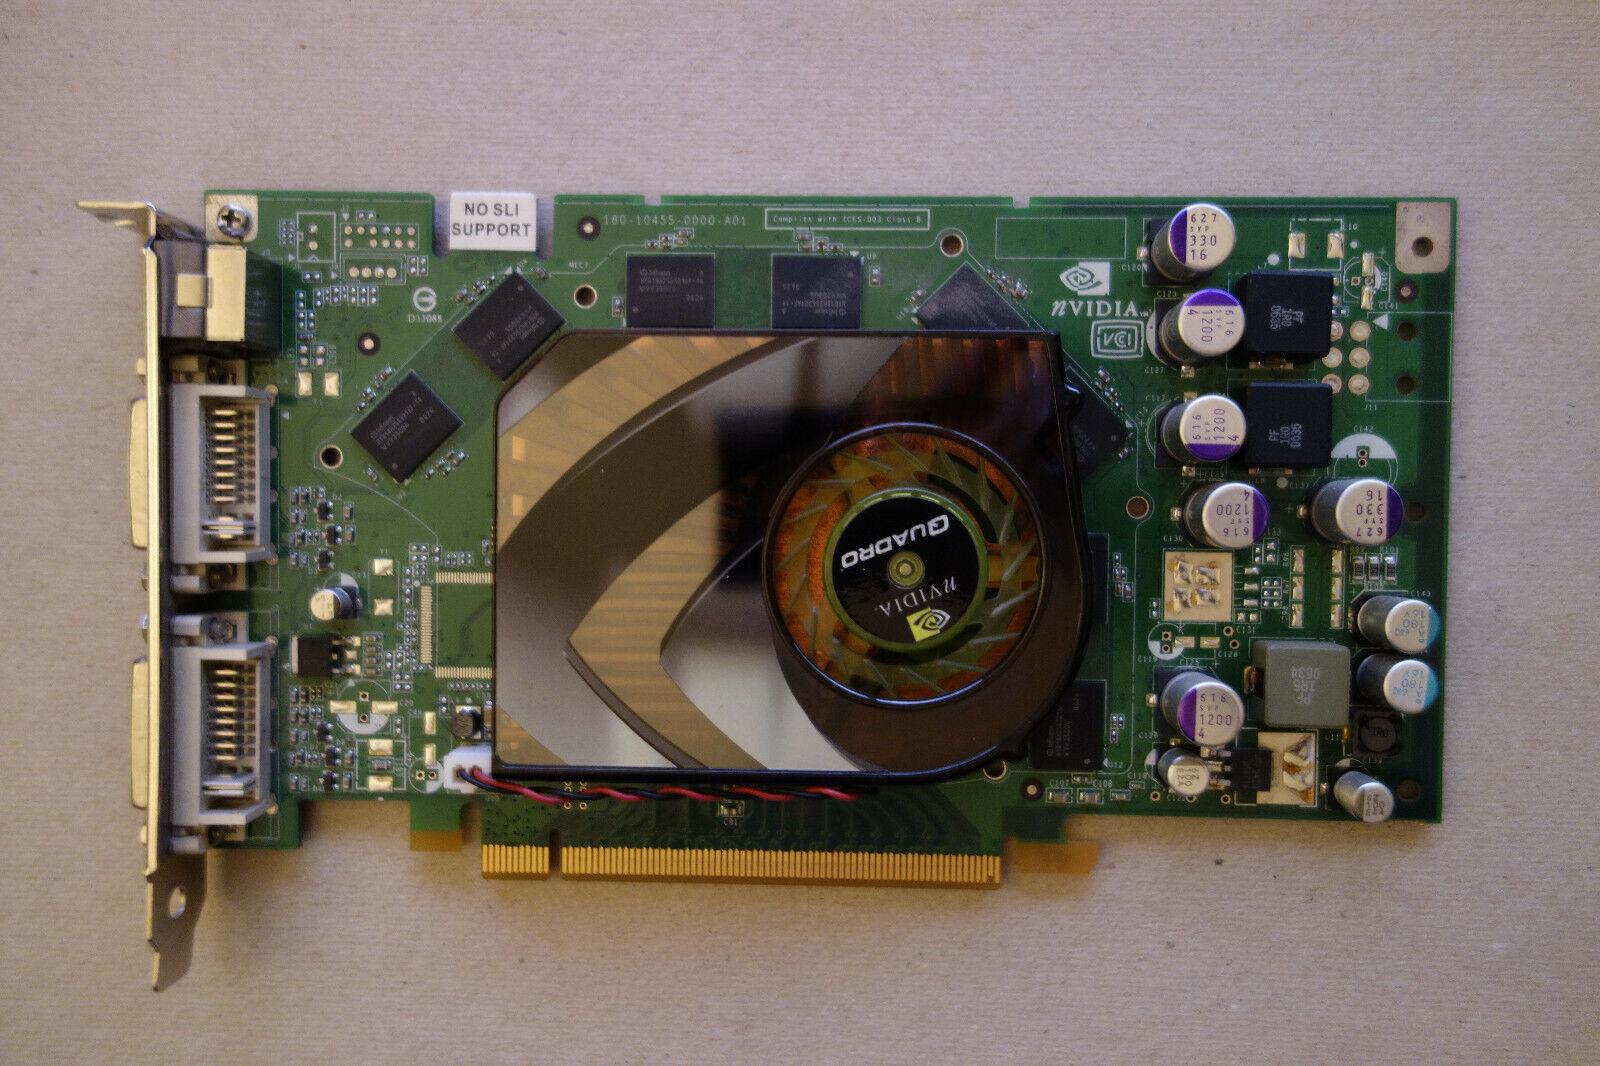 PNY NVIDIA Quadro FX 1500 256MB DDR3 Graphics Card PCI